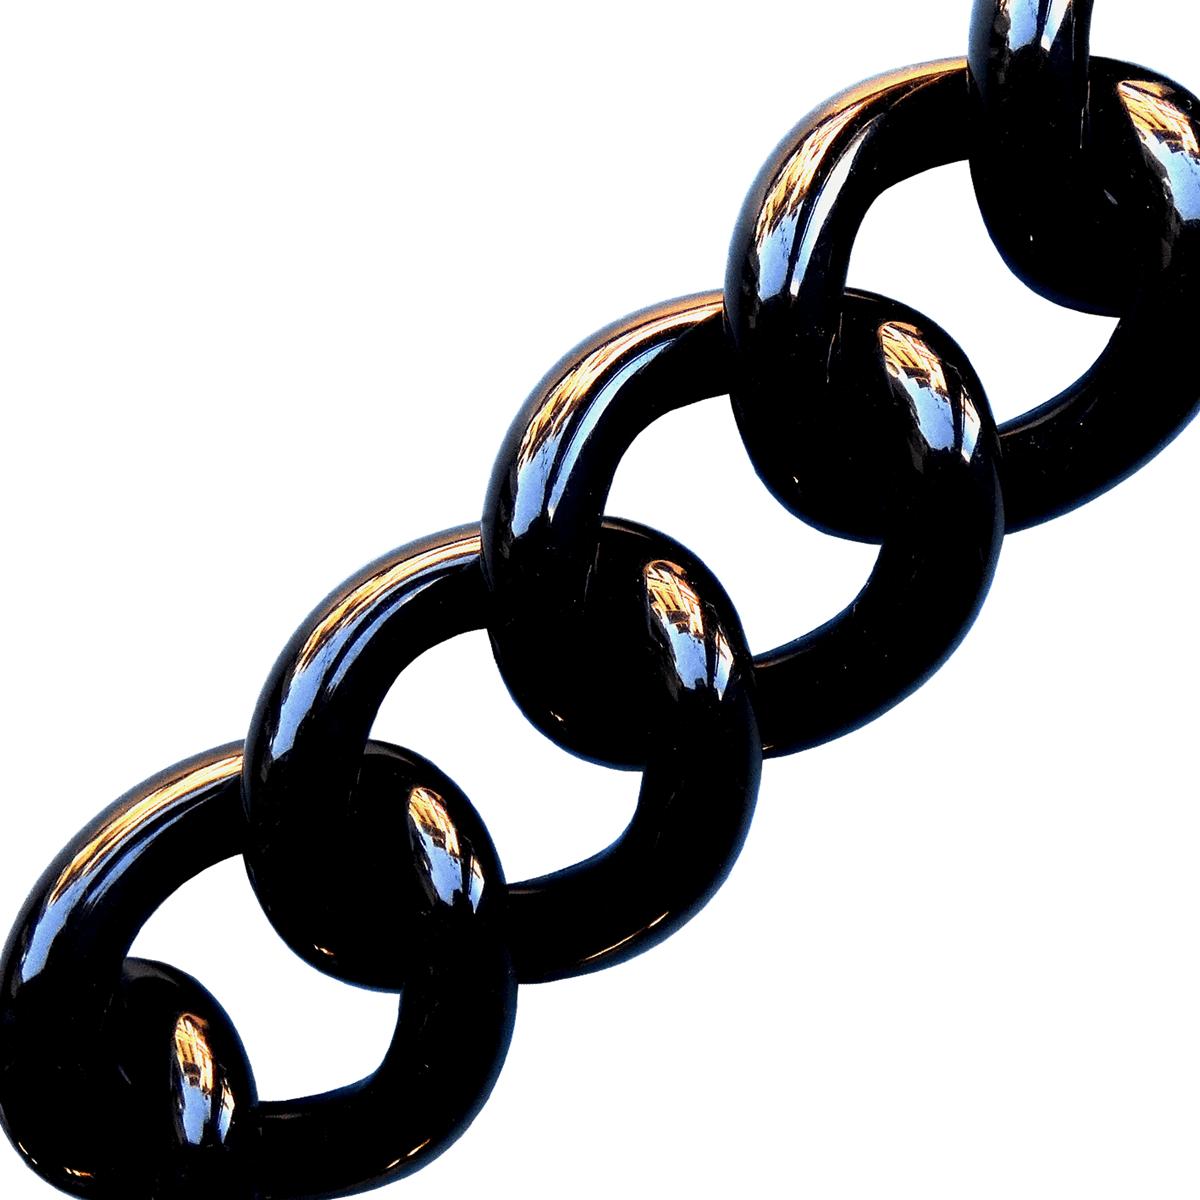 kalaika chunky chaîne bracelet maille acrylique réglisse - cassisroyal.com